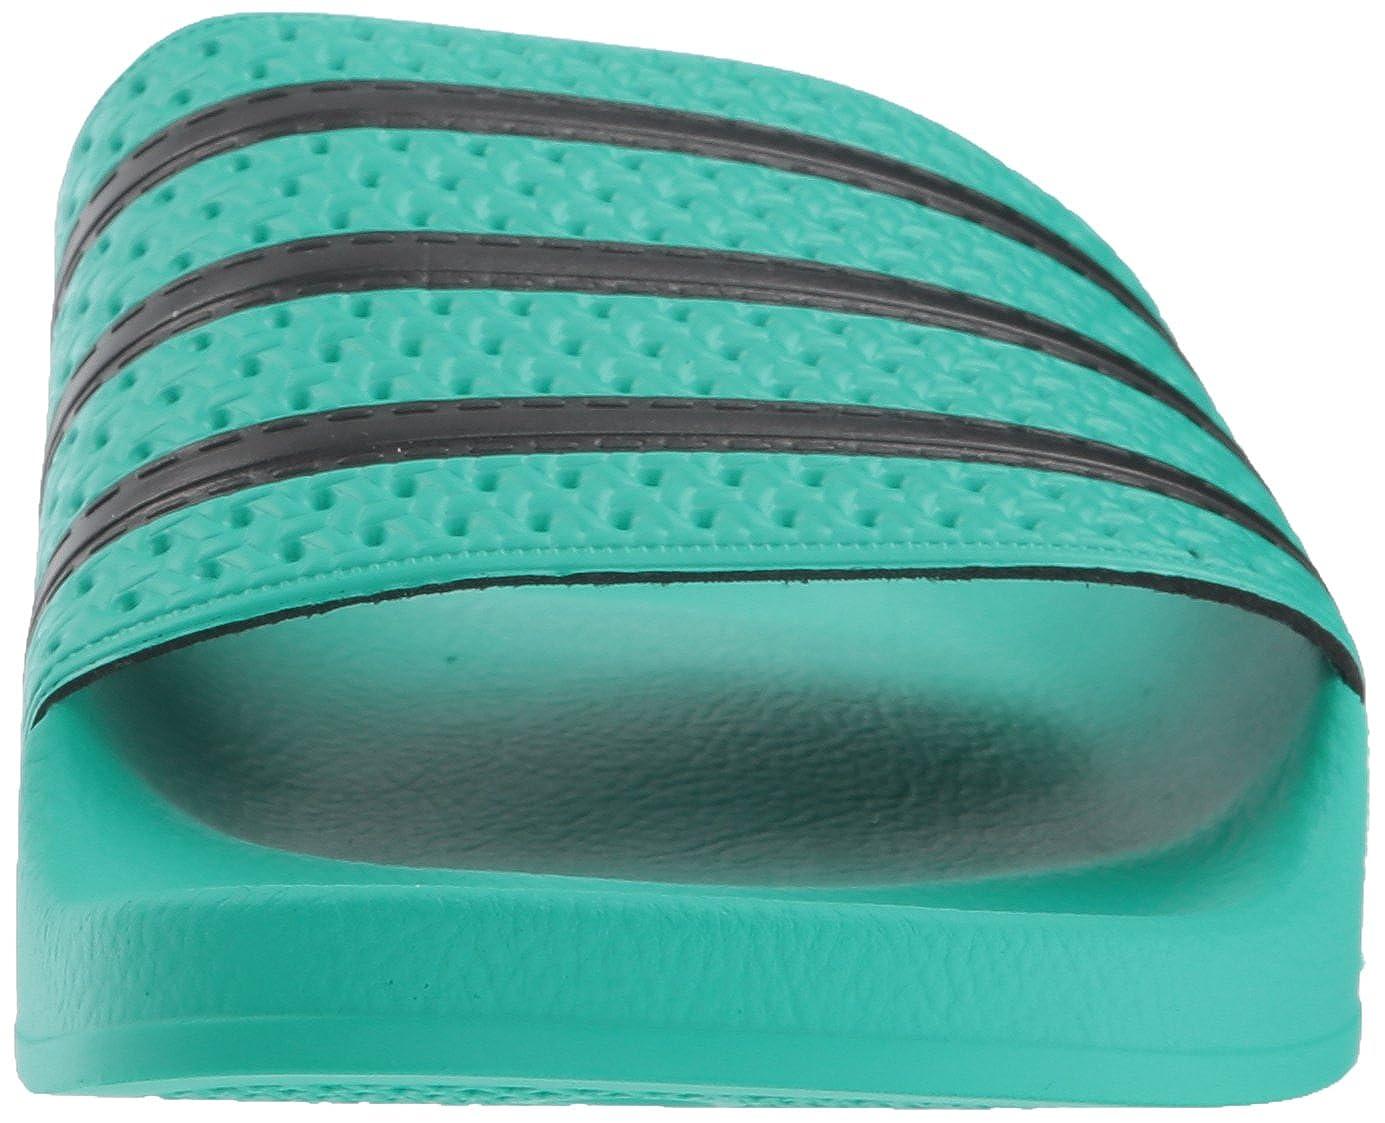 Adidas Unisex-Erwachsene Originals ADILETTE Bade Sandalen    78e0ca